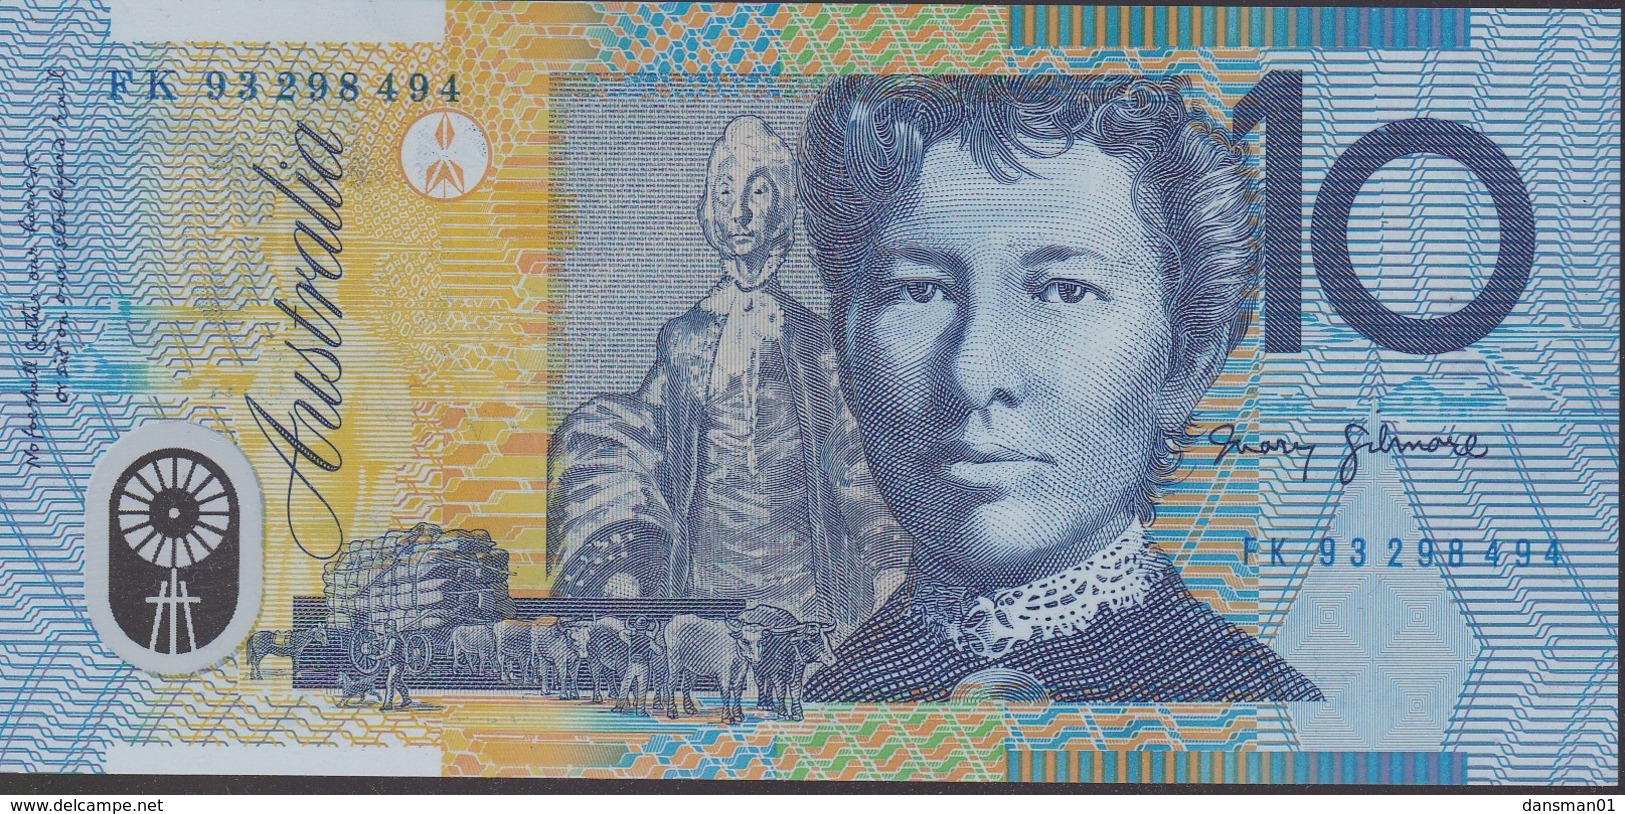 Australia 1993 Polymer $10 FK 93298494 Uncirculated - 1992-2001 (Polymer)